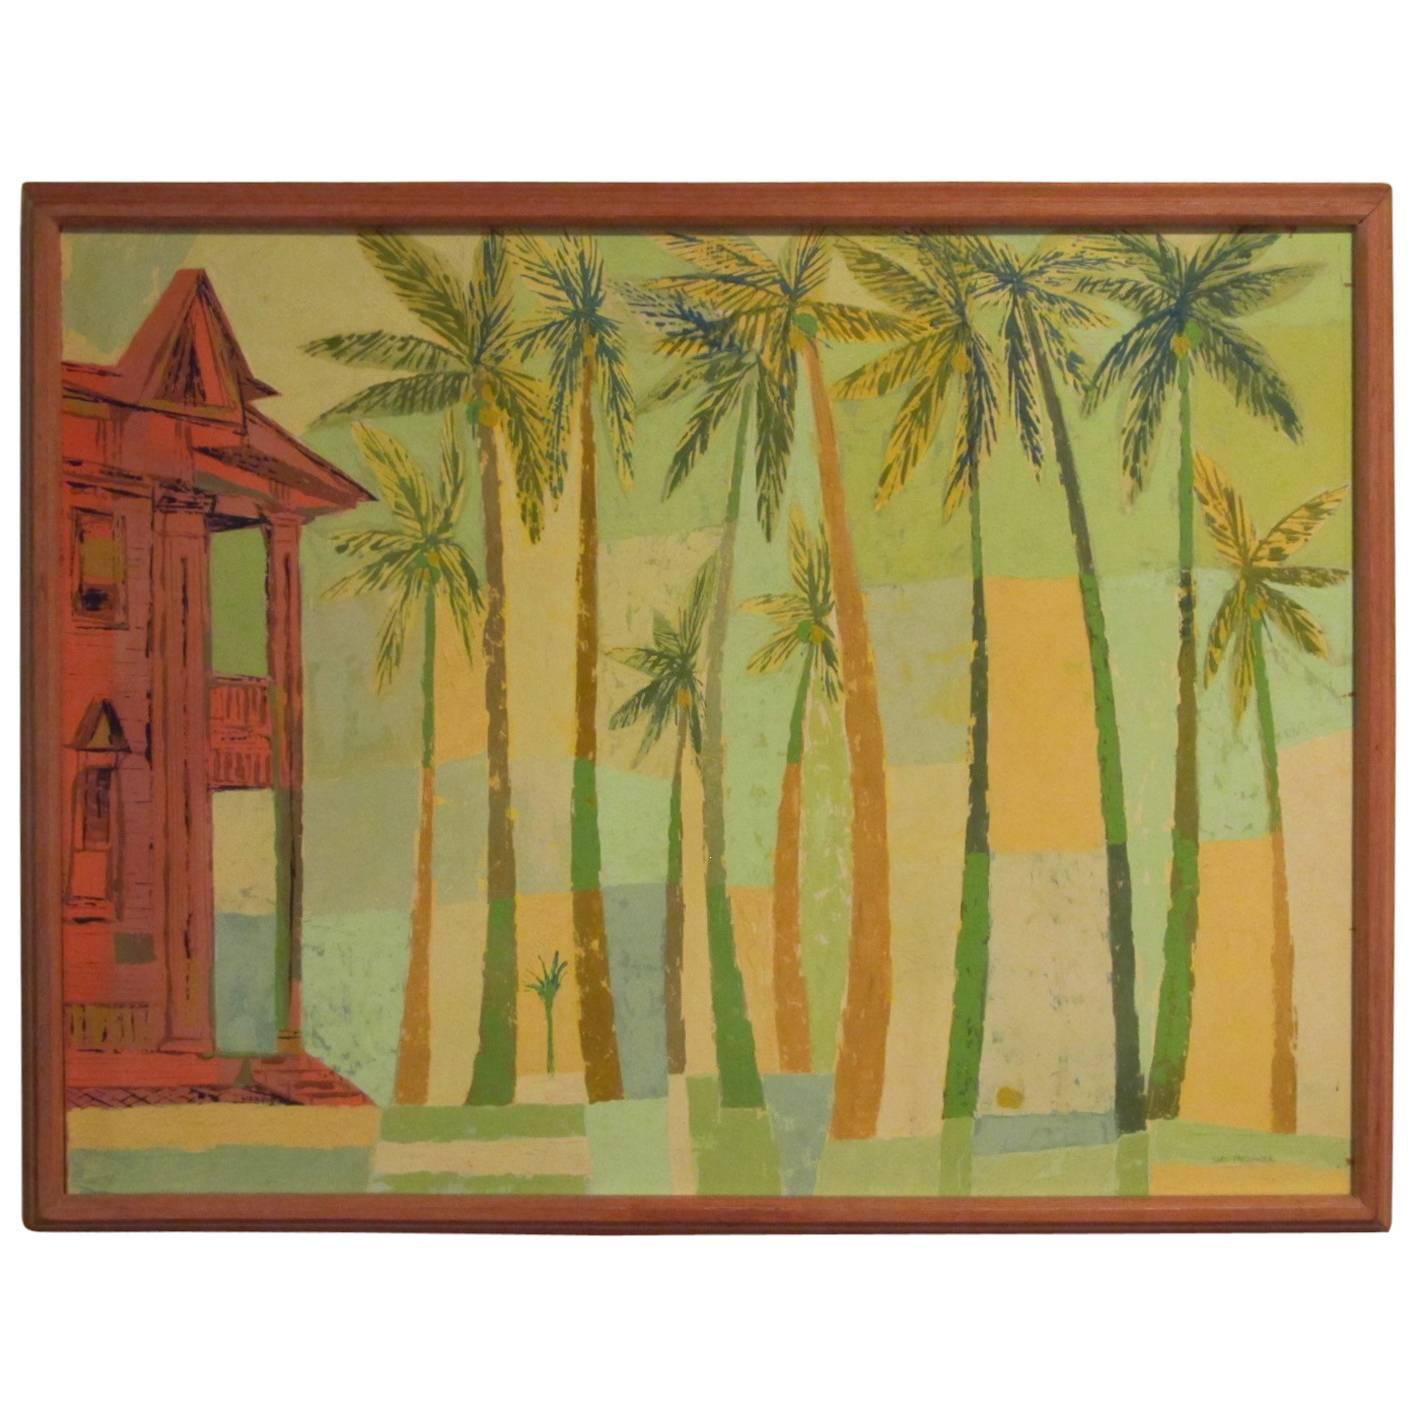 5924633_z Painting Hawaii Plantation Home on louisiana plantation paintings, north carolina plantation paintings, southern plantation paintings, hawaii sunrise paintings,